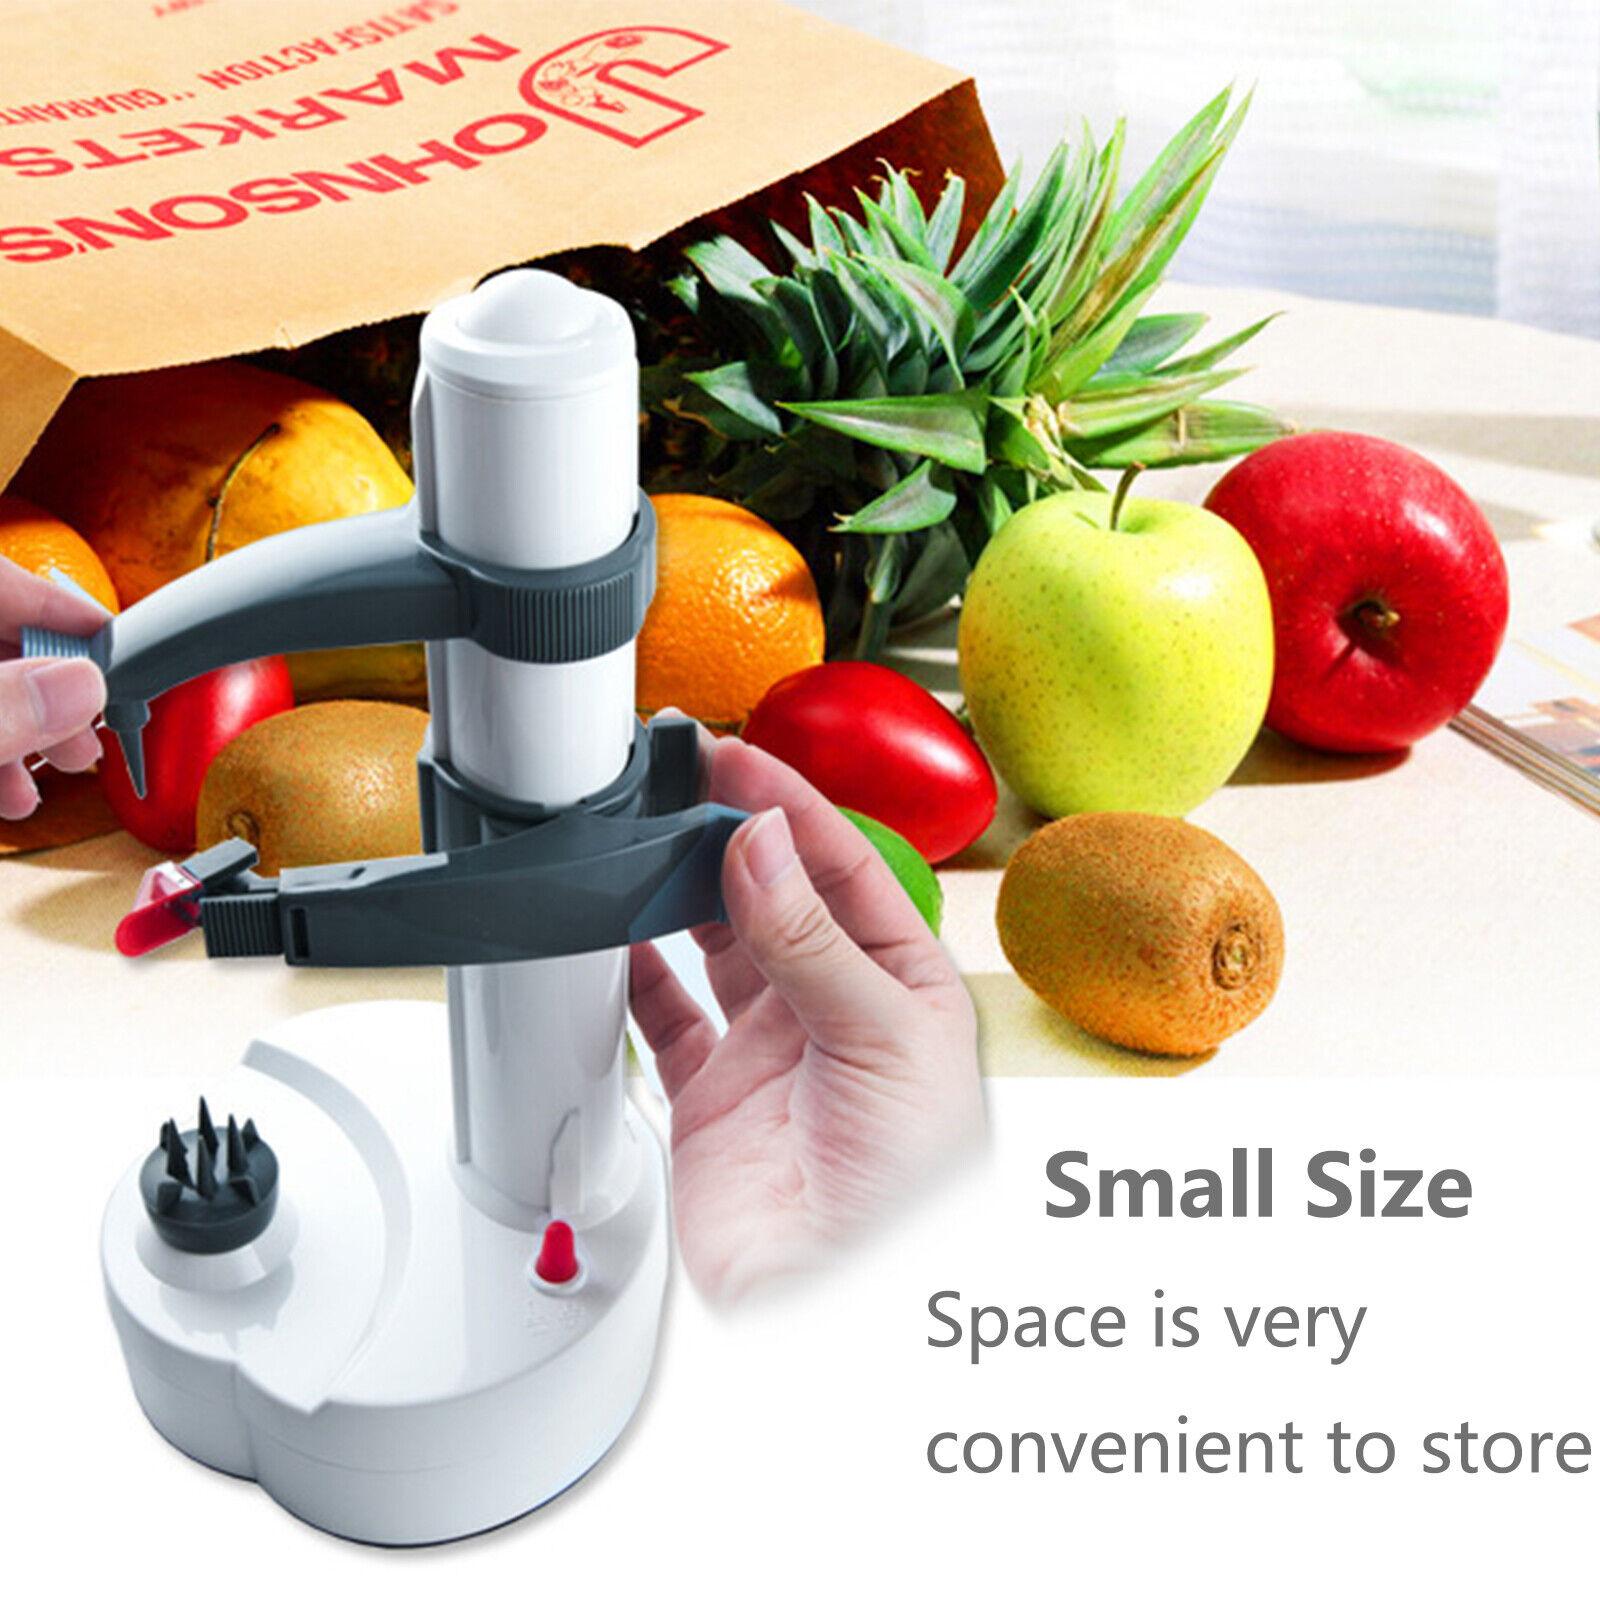 White Electric Automatic Peeler,Household Kitchen Peeling To